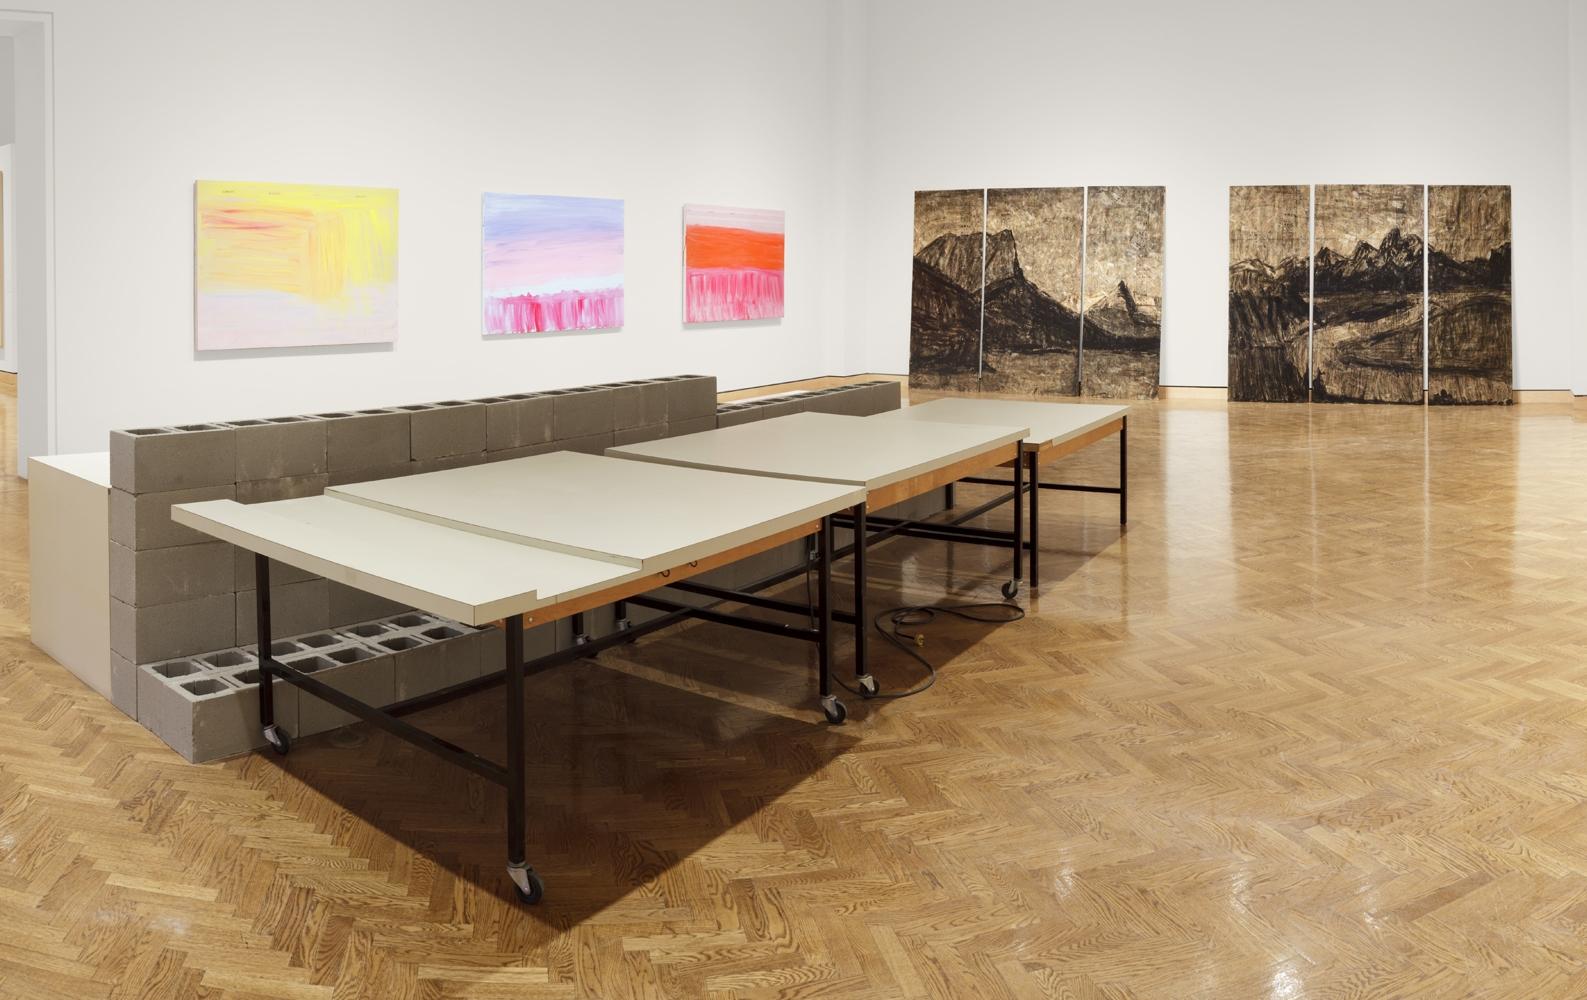 Seven Billion  at the Minnesota Artists Exhibition Program